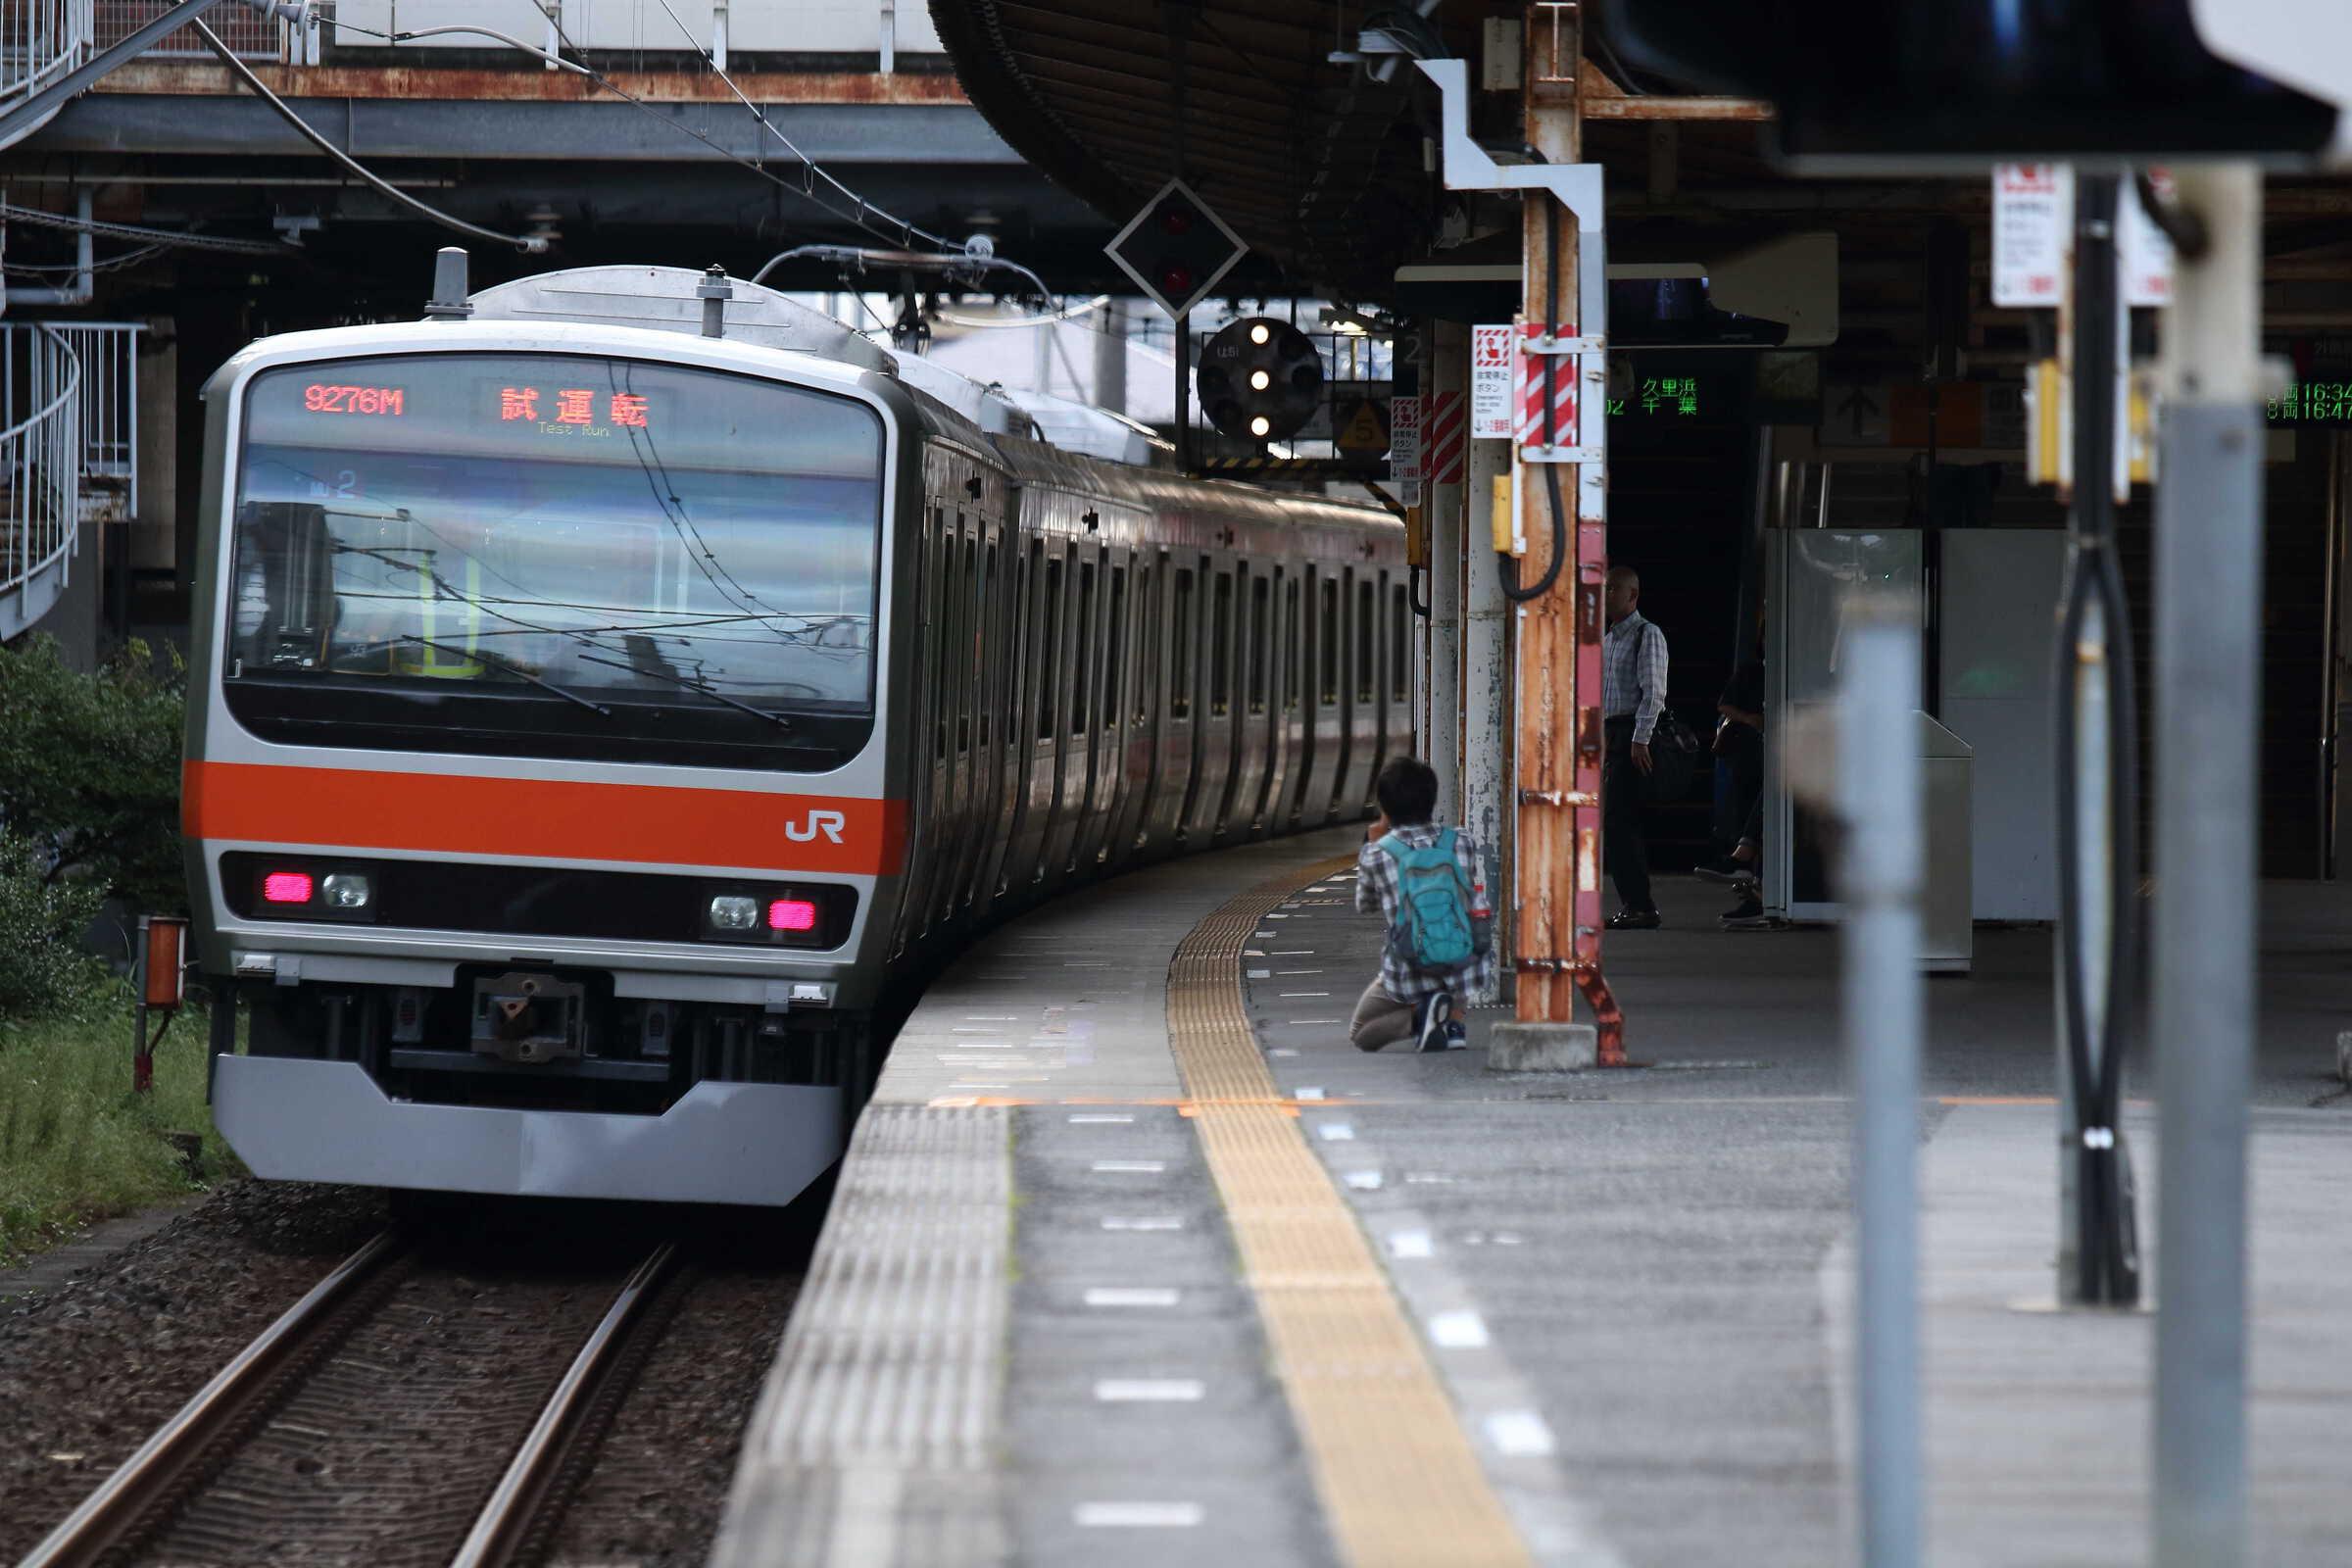 https://train-photo-blog.hiroto-k.net/photos/2017/09/23/IMG_2083_de.JPG